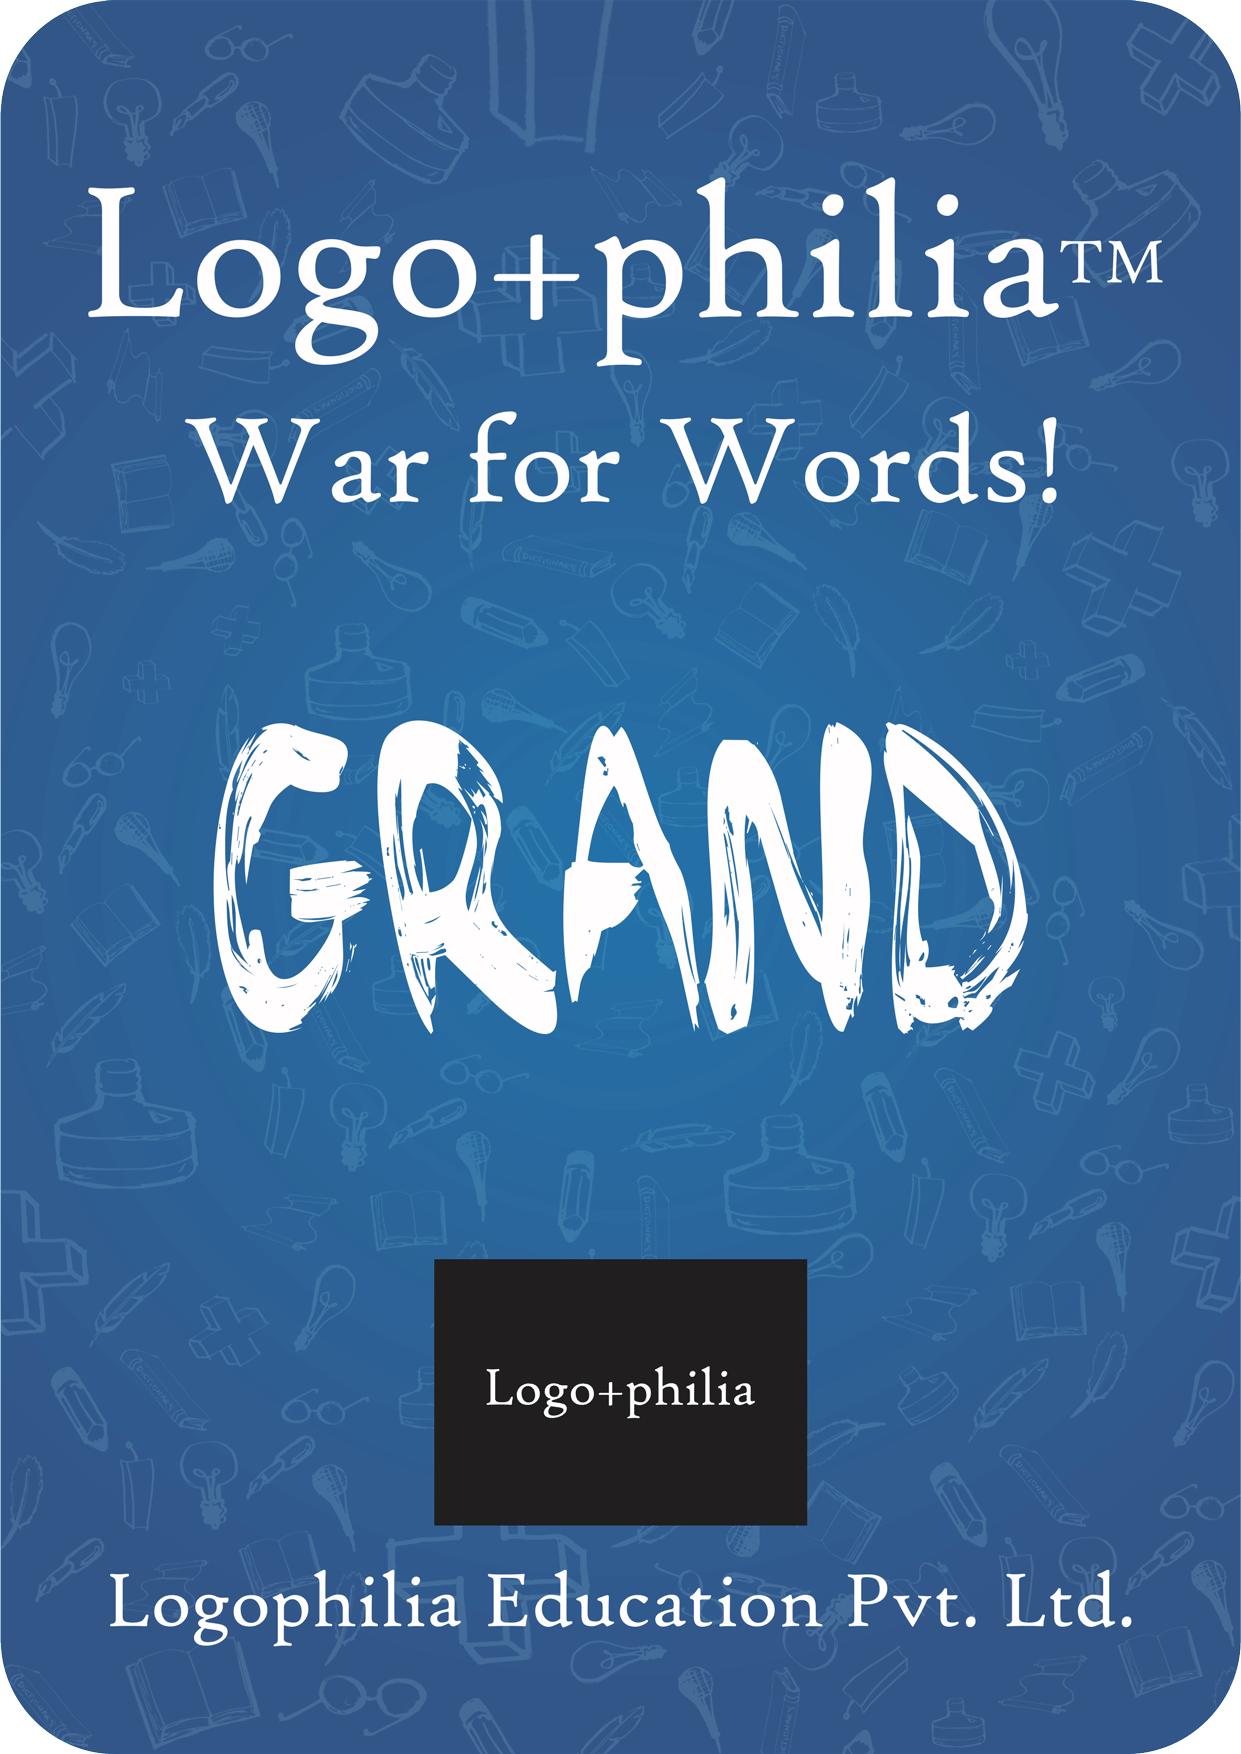 Logophilia Grand